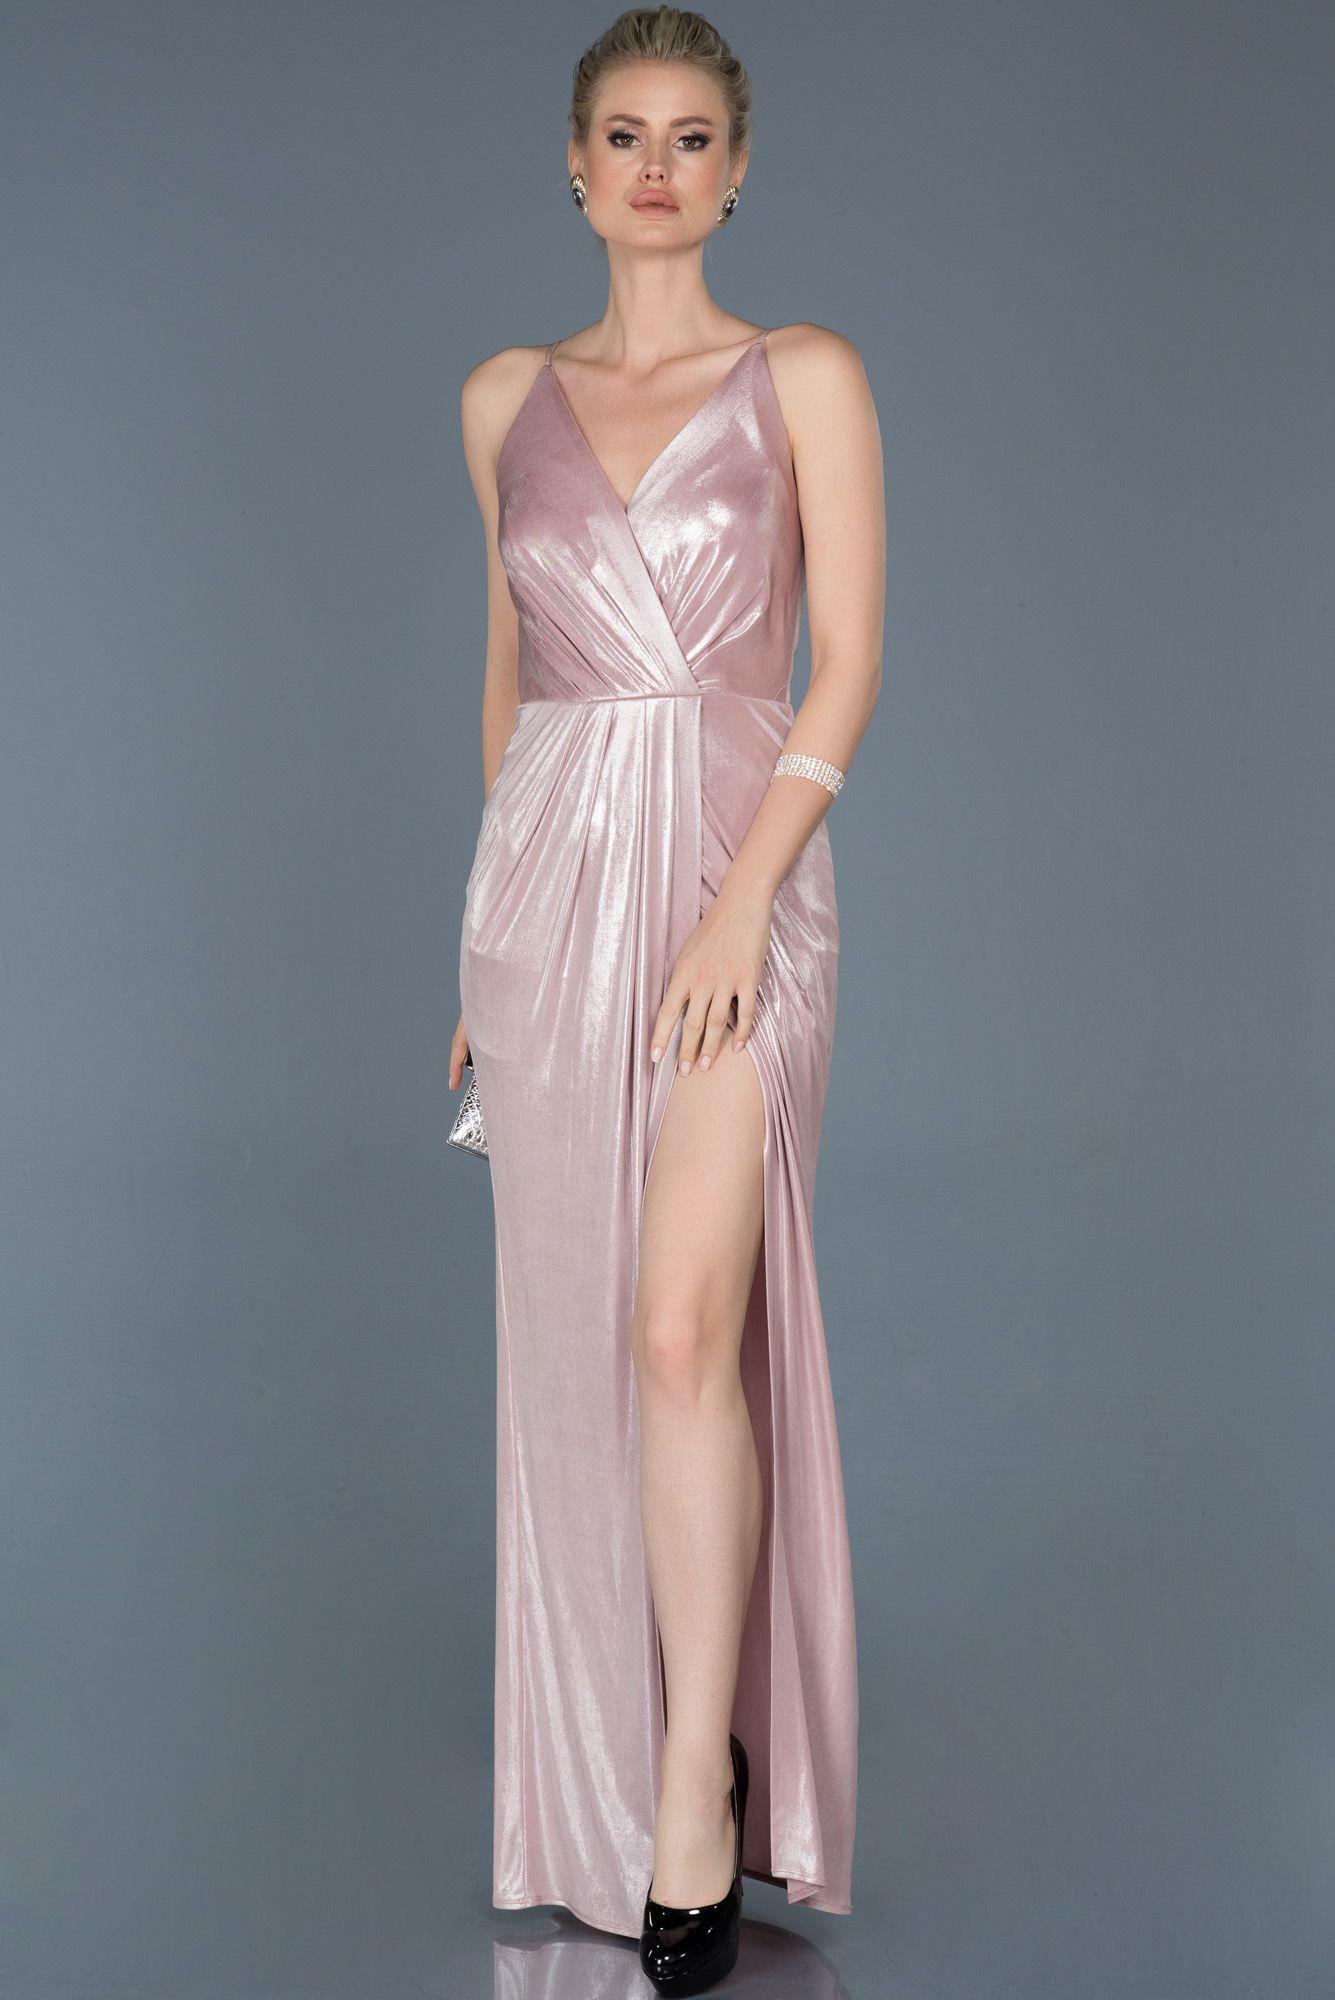 Pembe Uzun Bacak Dekolteli Saten Mezuniyet Elbisesi Abu857 2020 Elbise Modelleri Elbise The Dress